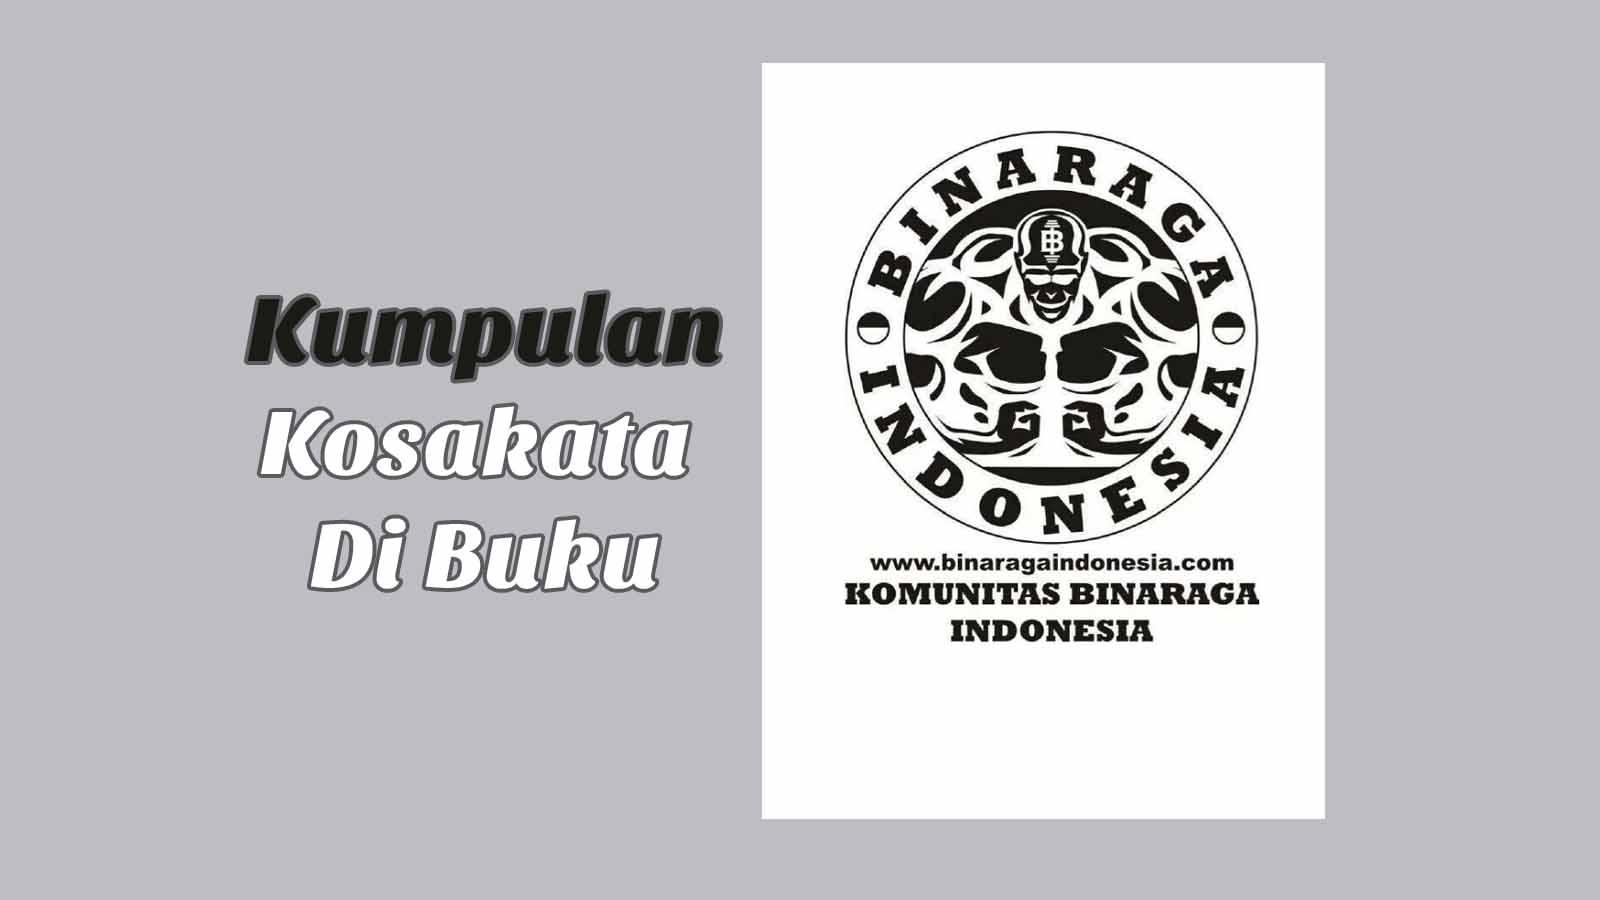 Kumpulan Kosakata Di Buku Binaraga Indonesia Manual Book